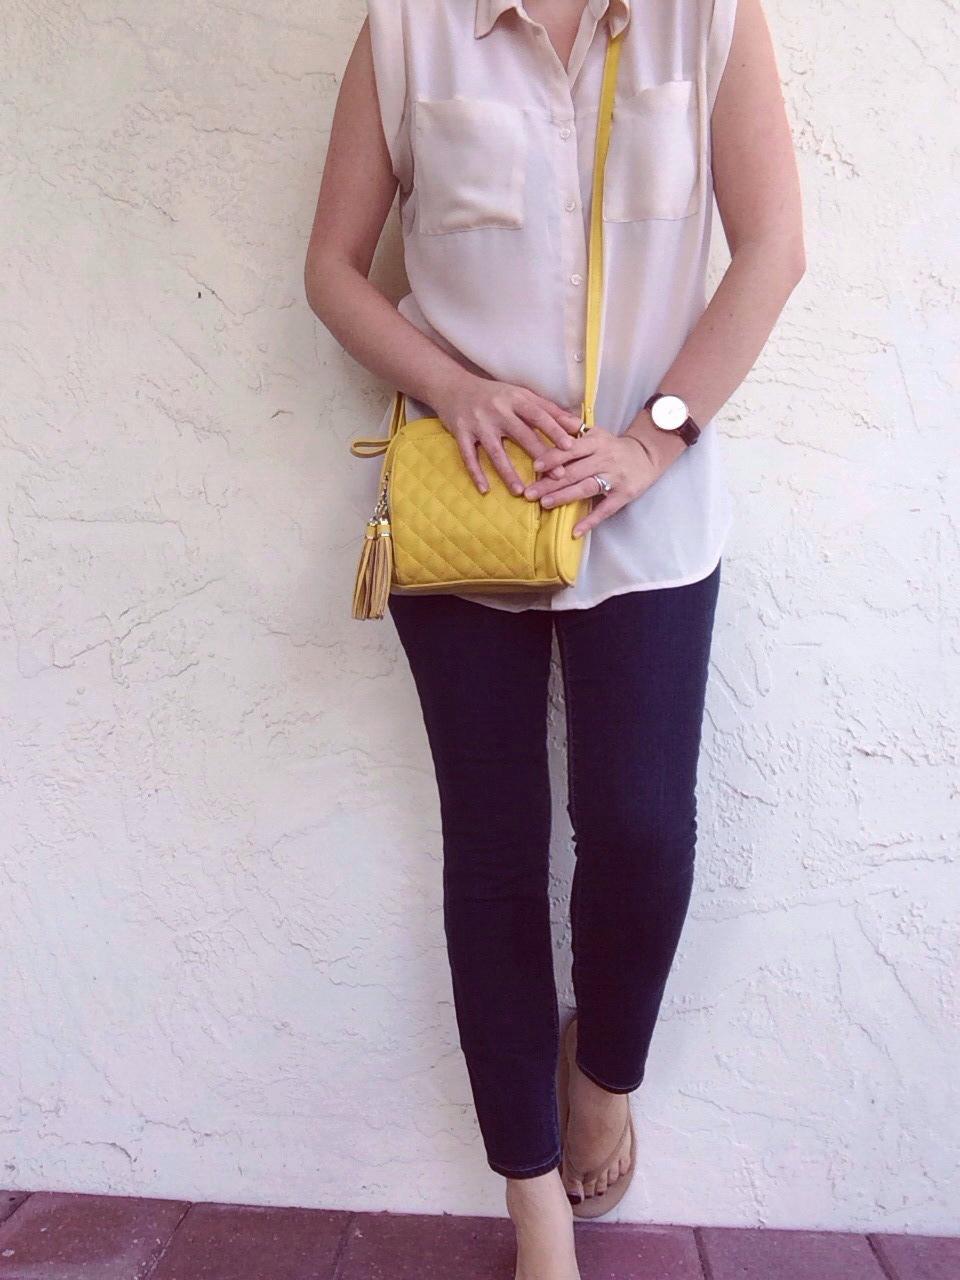 yellow handbag | A Pretty Penny